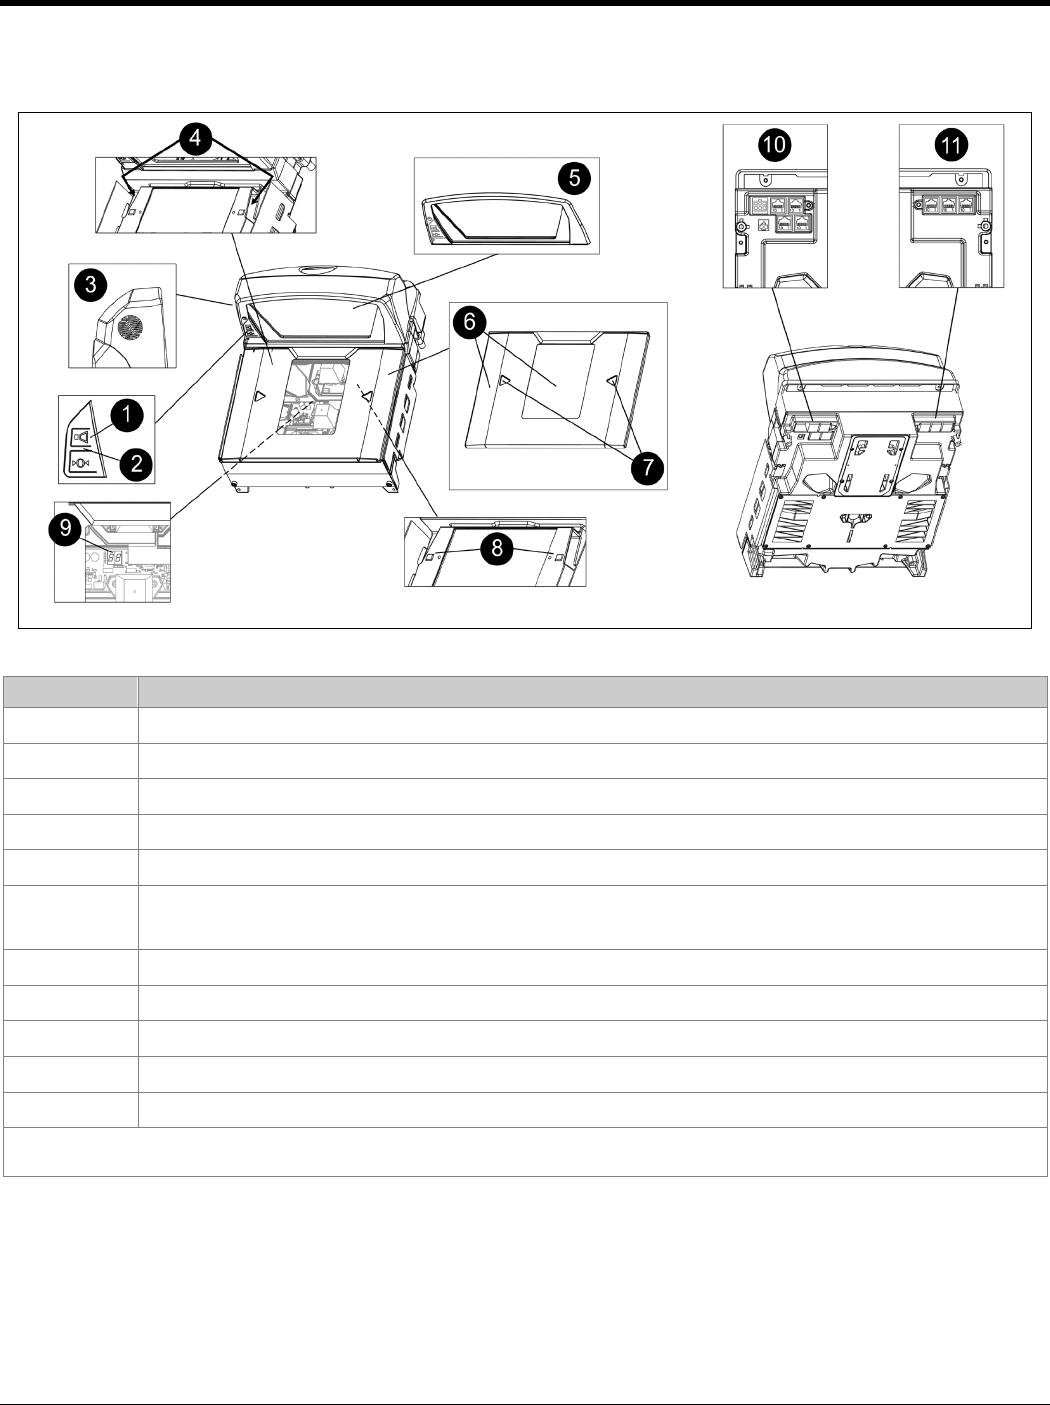 Honeywell MS2421 / MS2422 MS2431 Bar Code Scanner